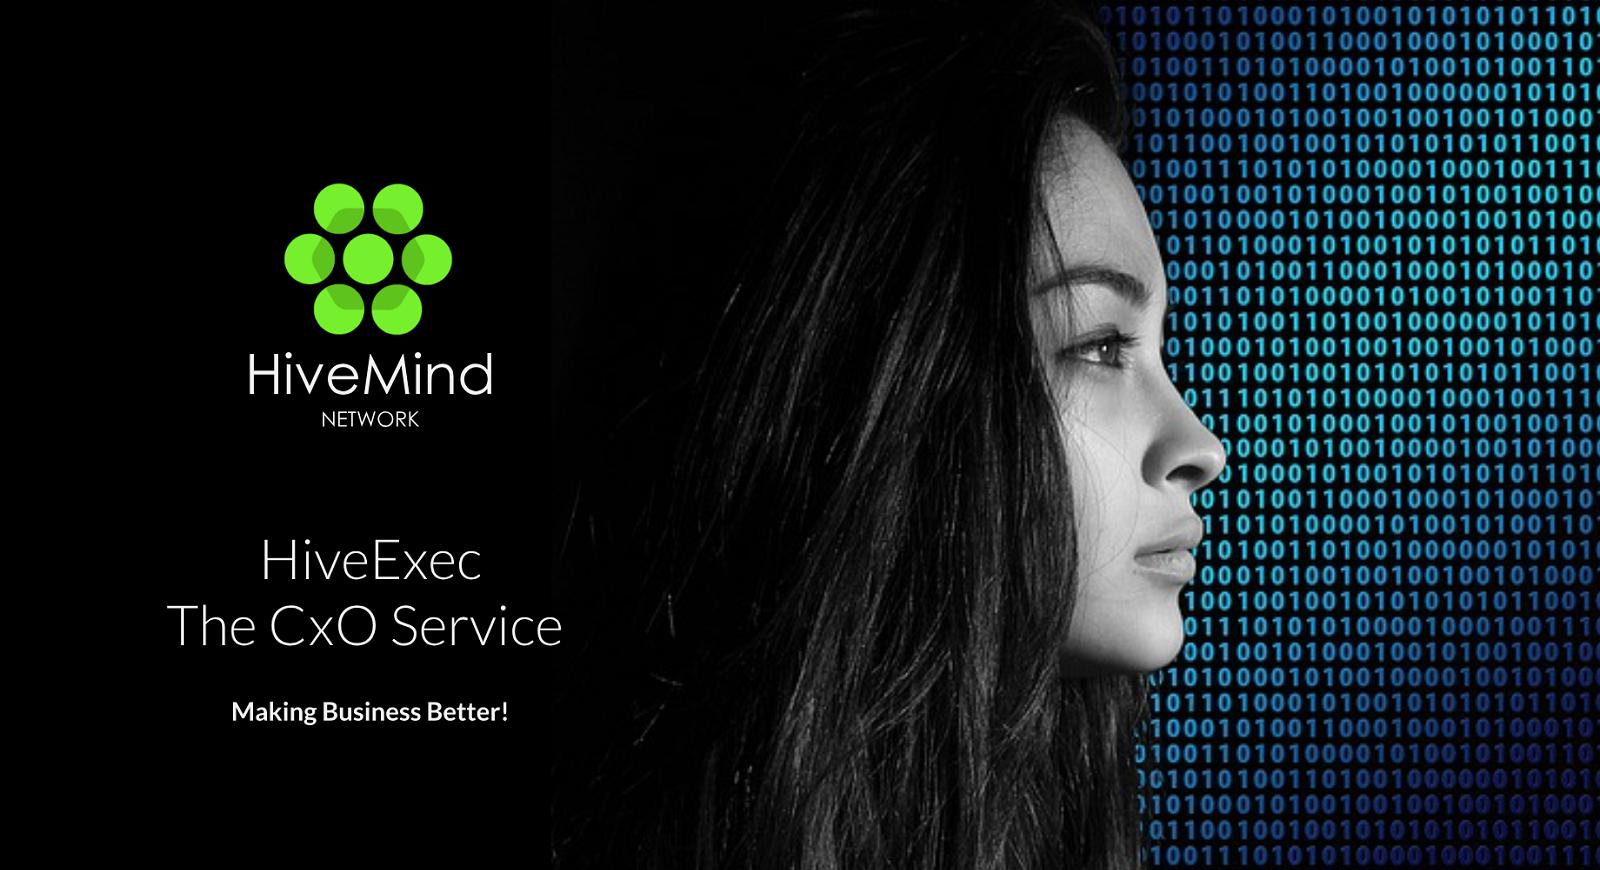 HiveExec - the CxO Service